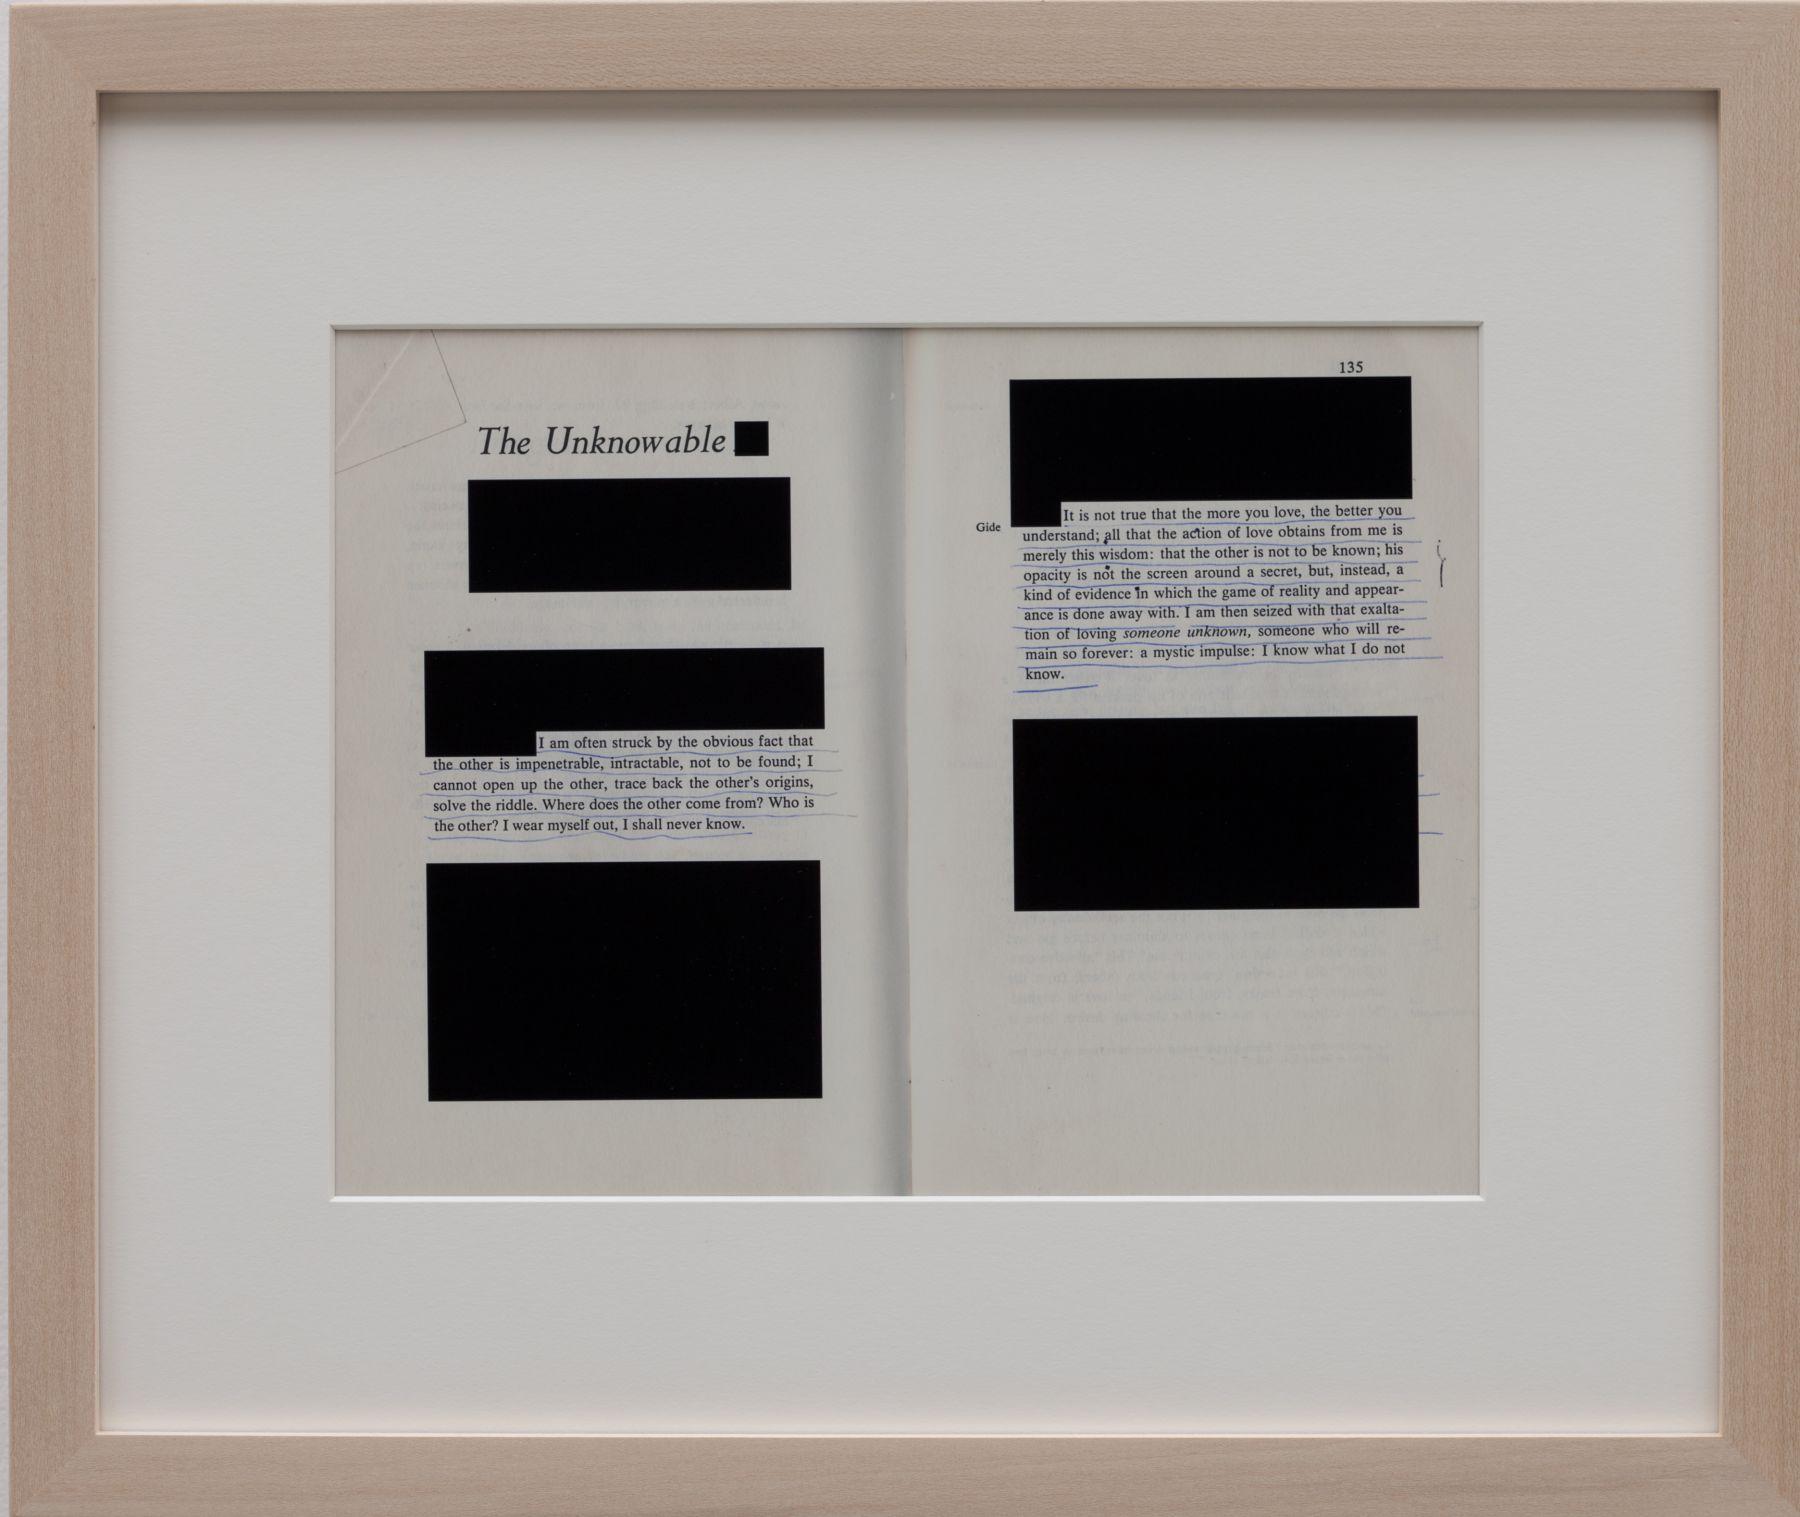 Valeska Soares, Edit (The Unknowable), 2012